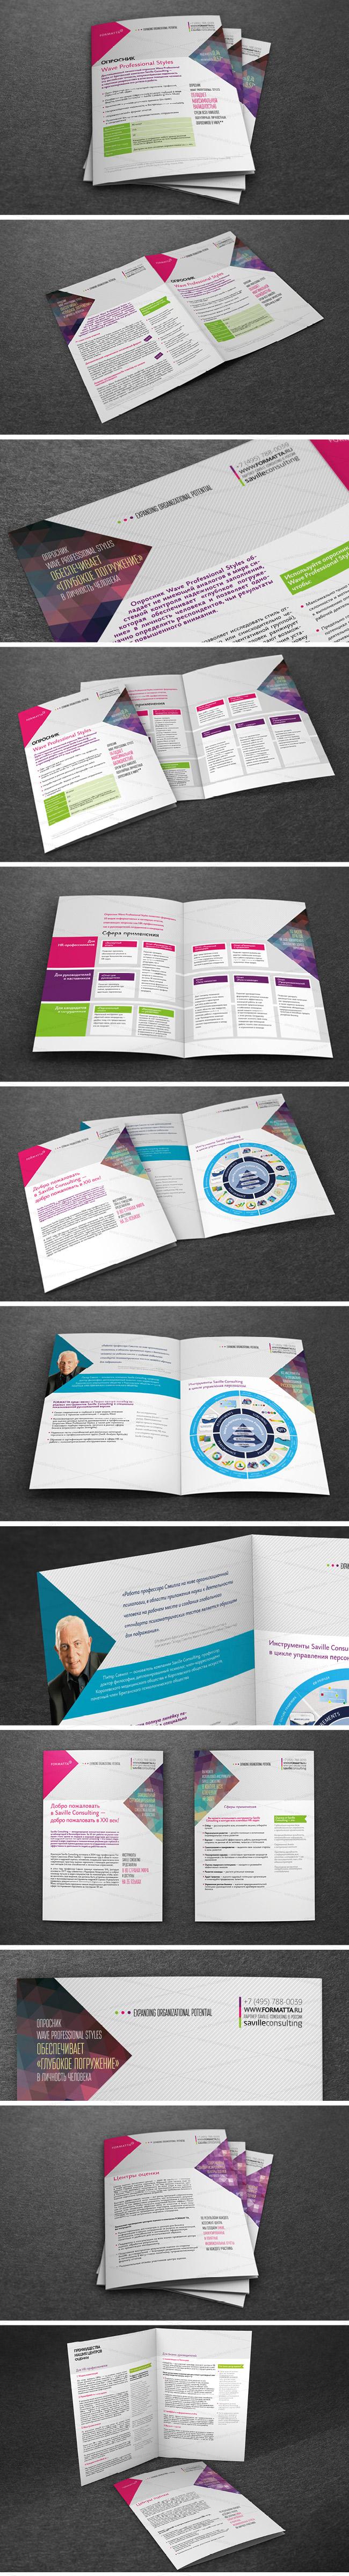 Booklet_Formatta_ok